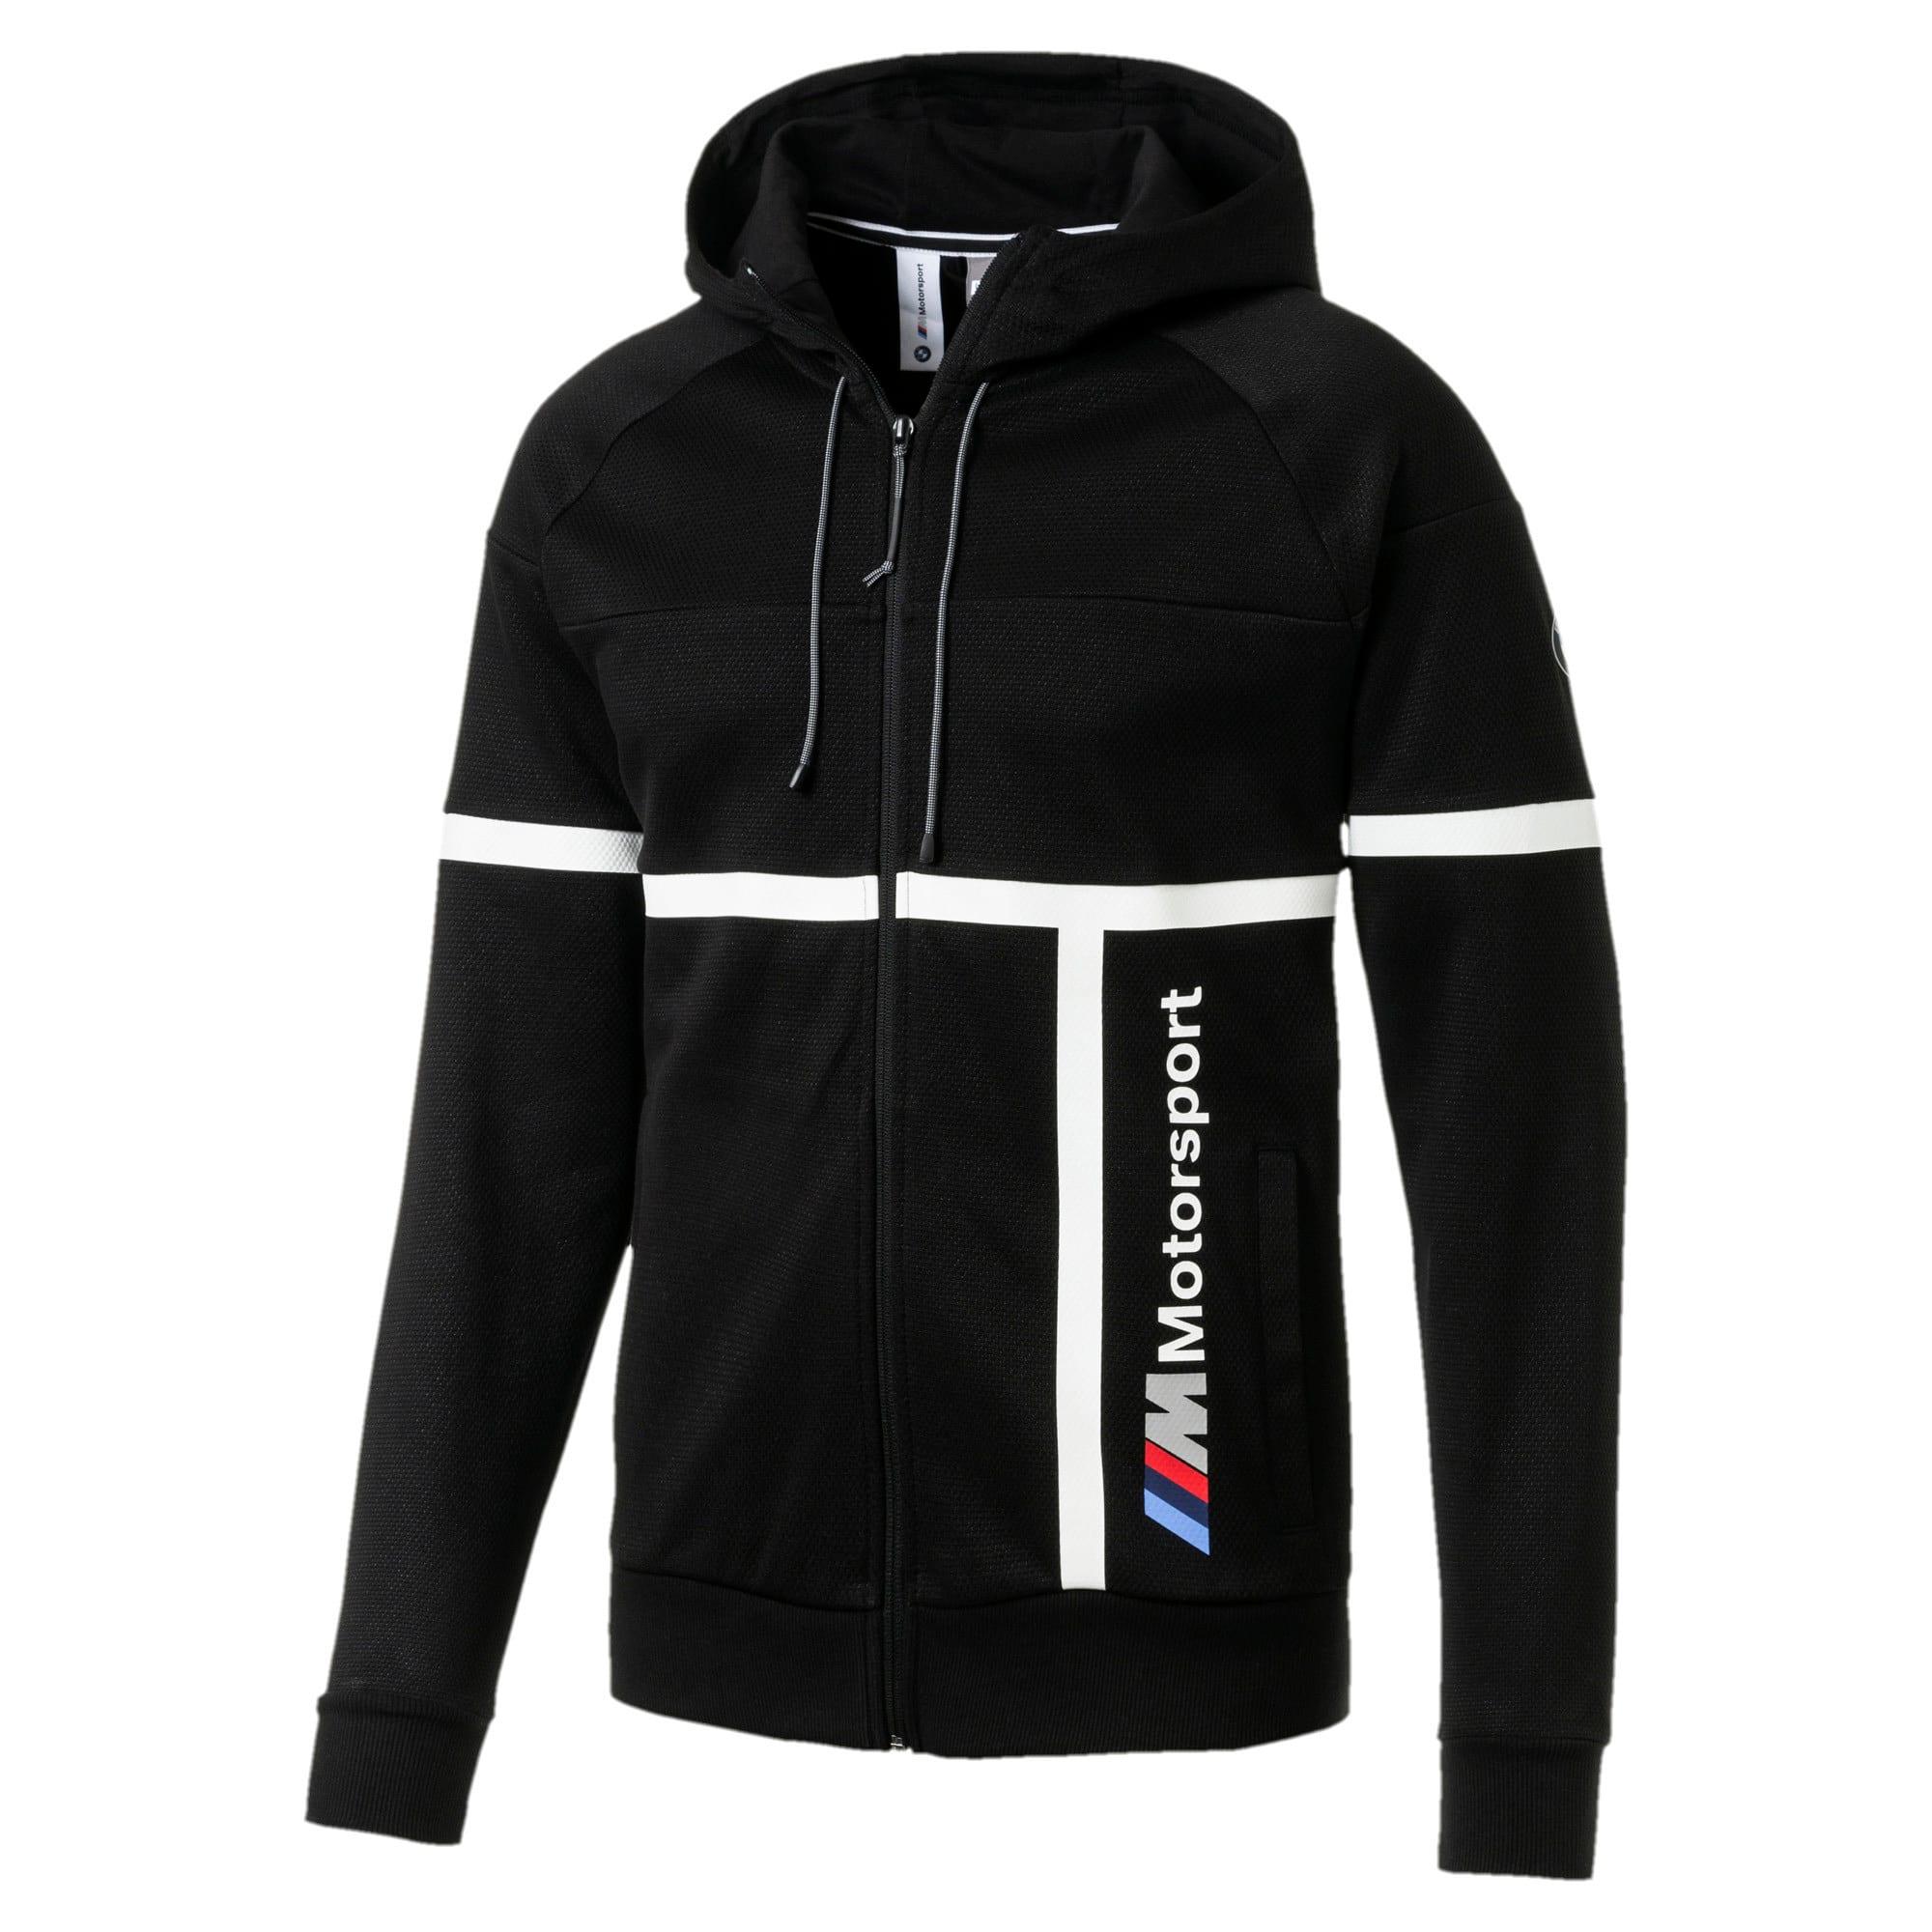 Thumbnail 4 of BMW M Motorsport Men's Hooded Sweat Jacket, Puma Black, medium